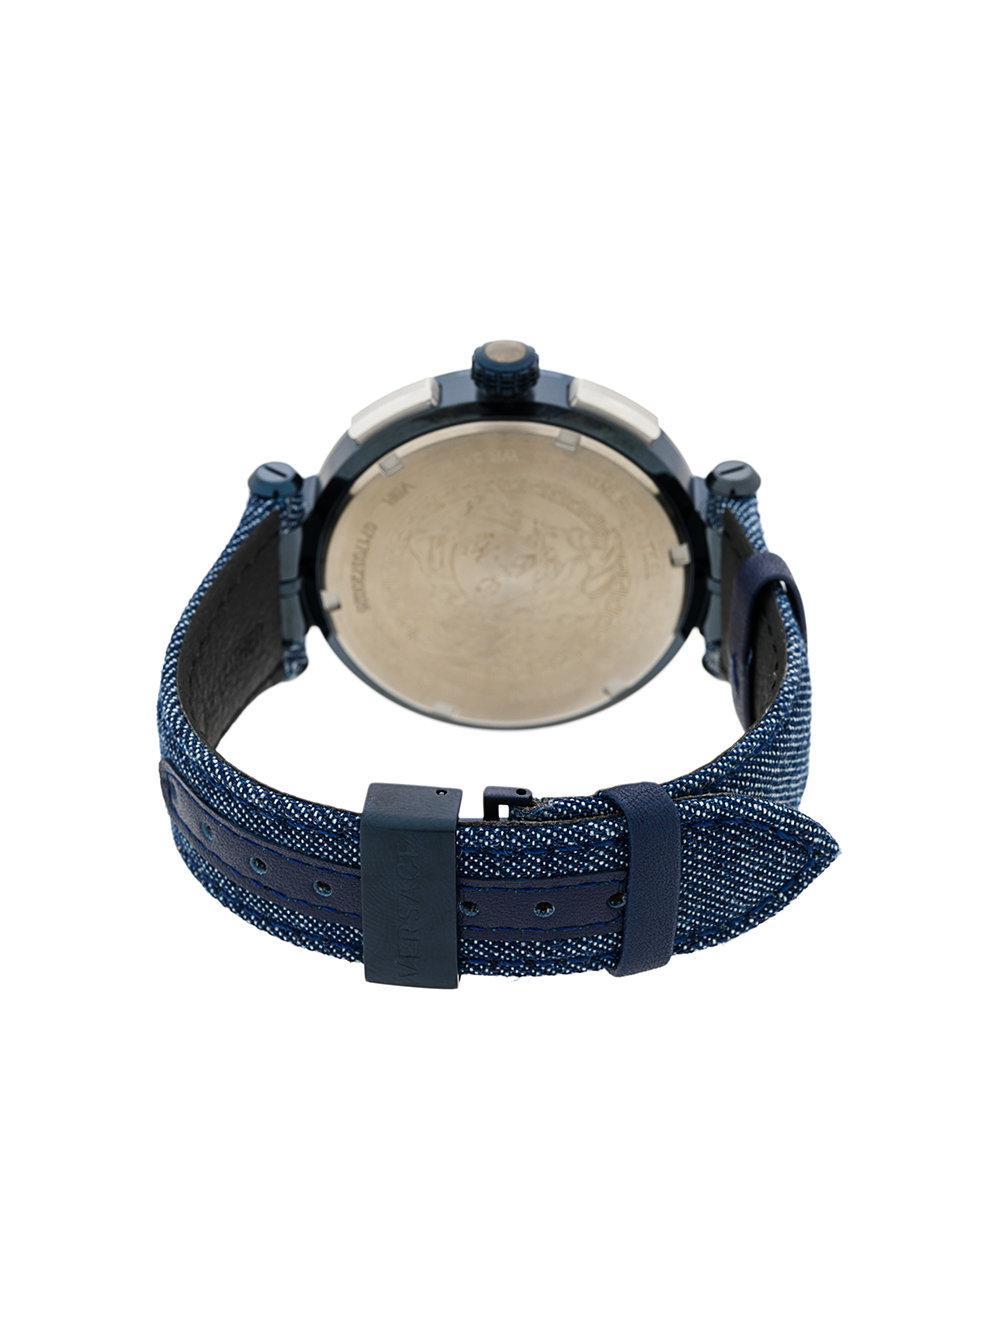 3f32c819f Versace Denim Aion Chrono Watch in Blue for Men - Lyst